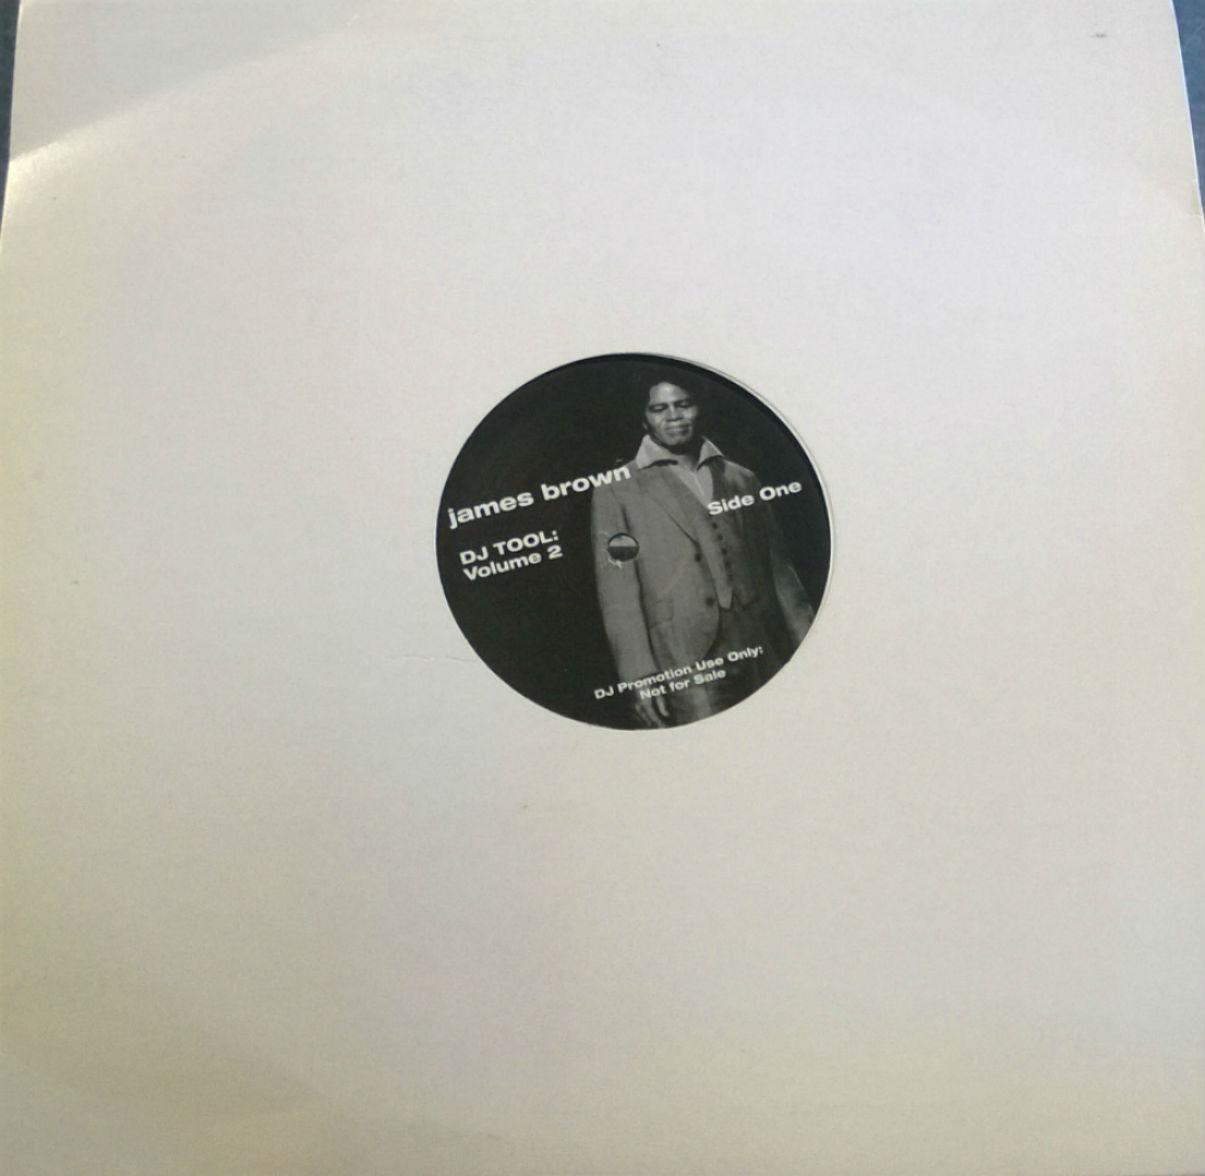 James Brown / DJ Tool: Volume 2